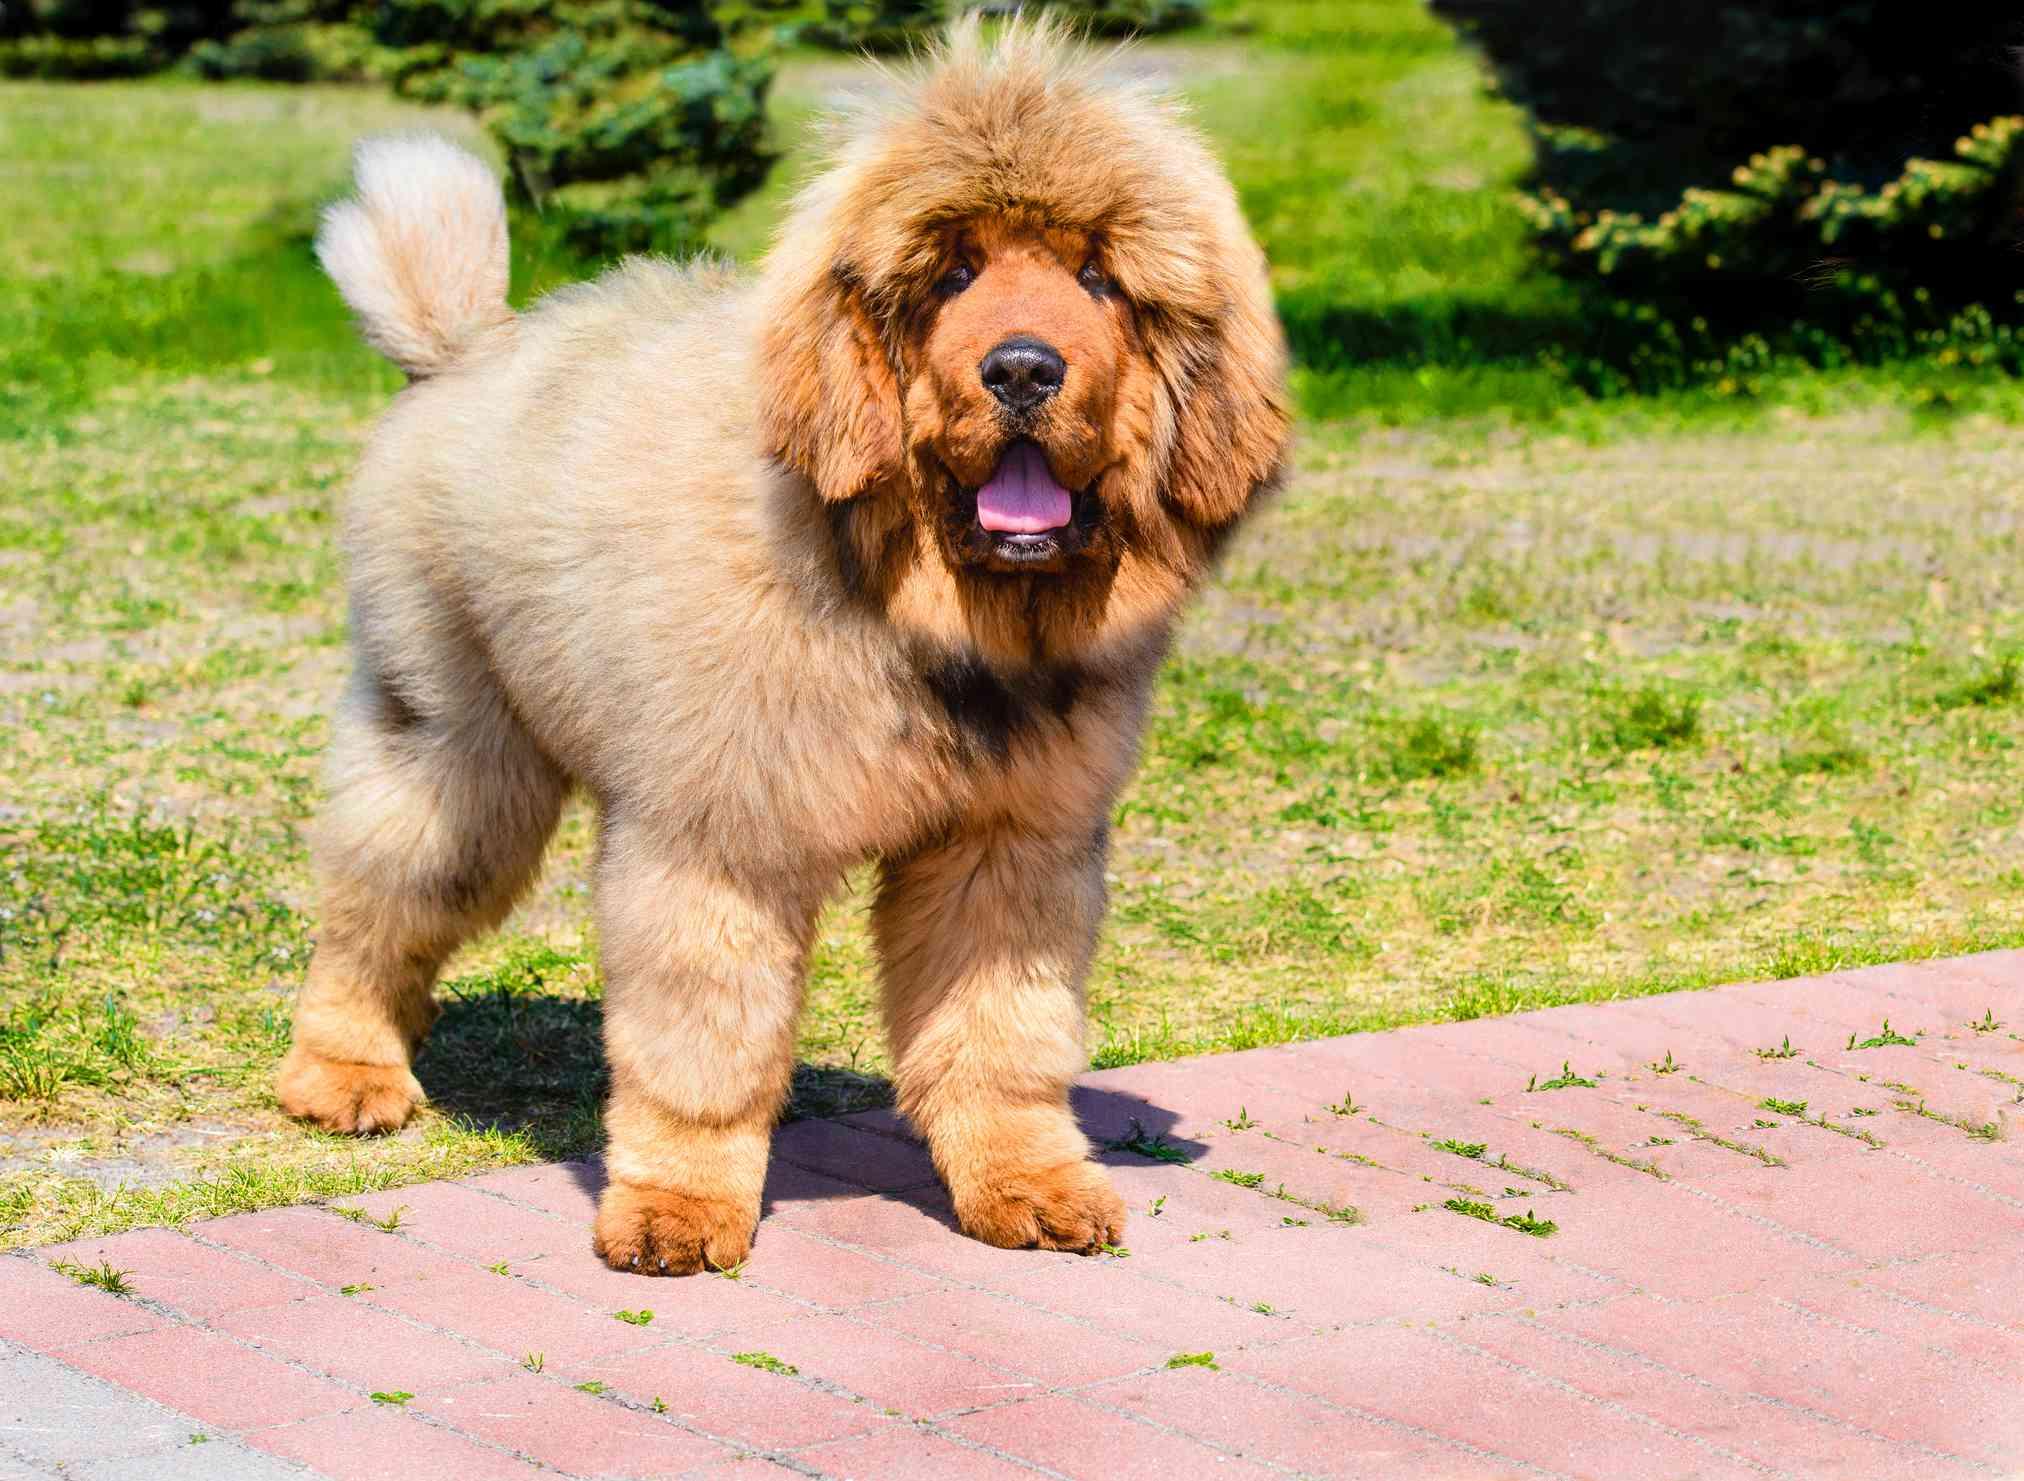 tibetan mastiff puppy with fluffy tan fur stands on brick path in sunlight